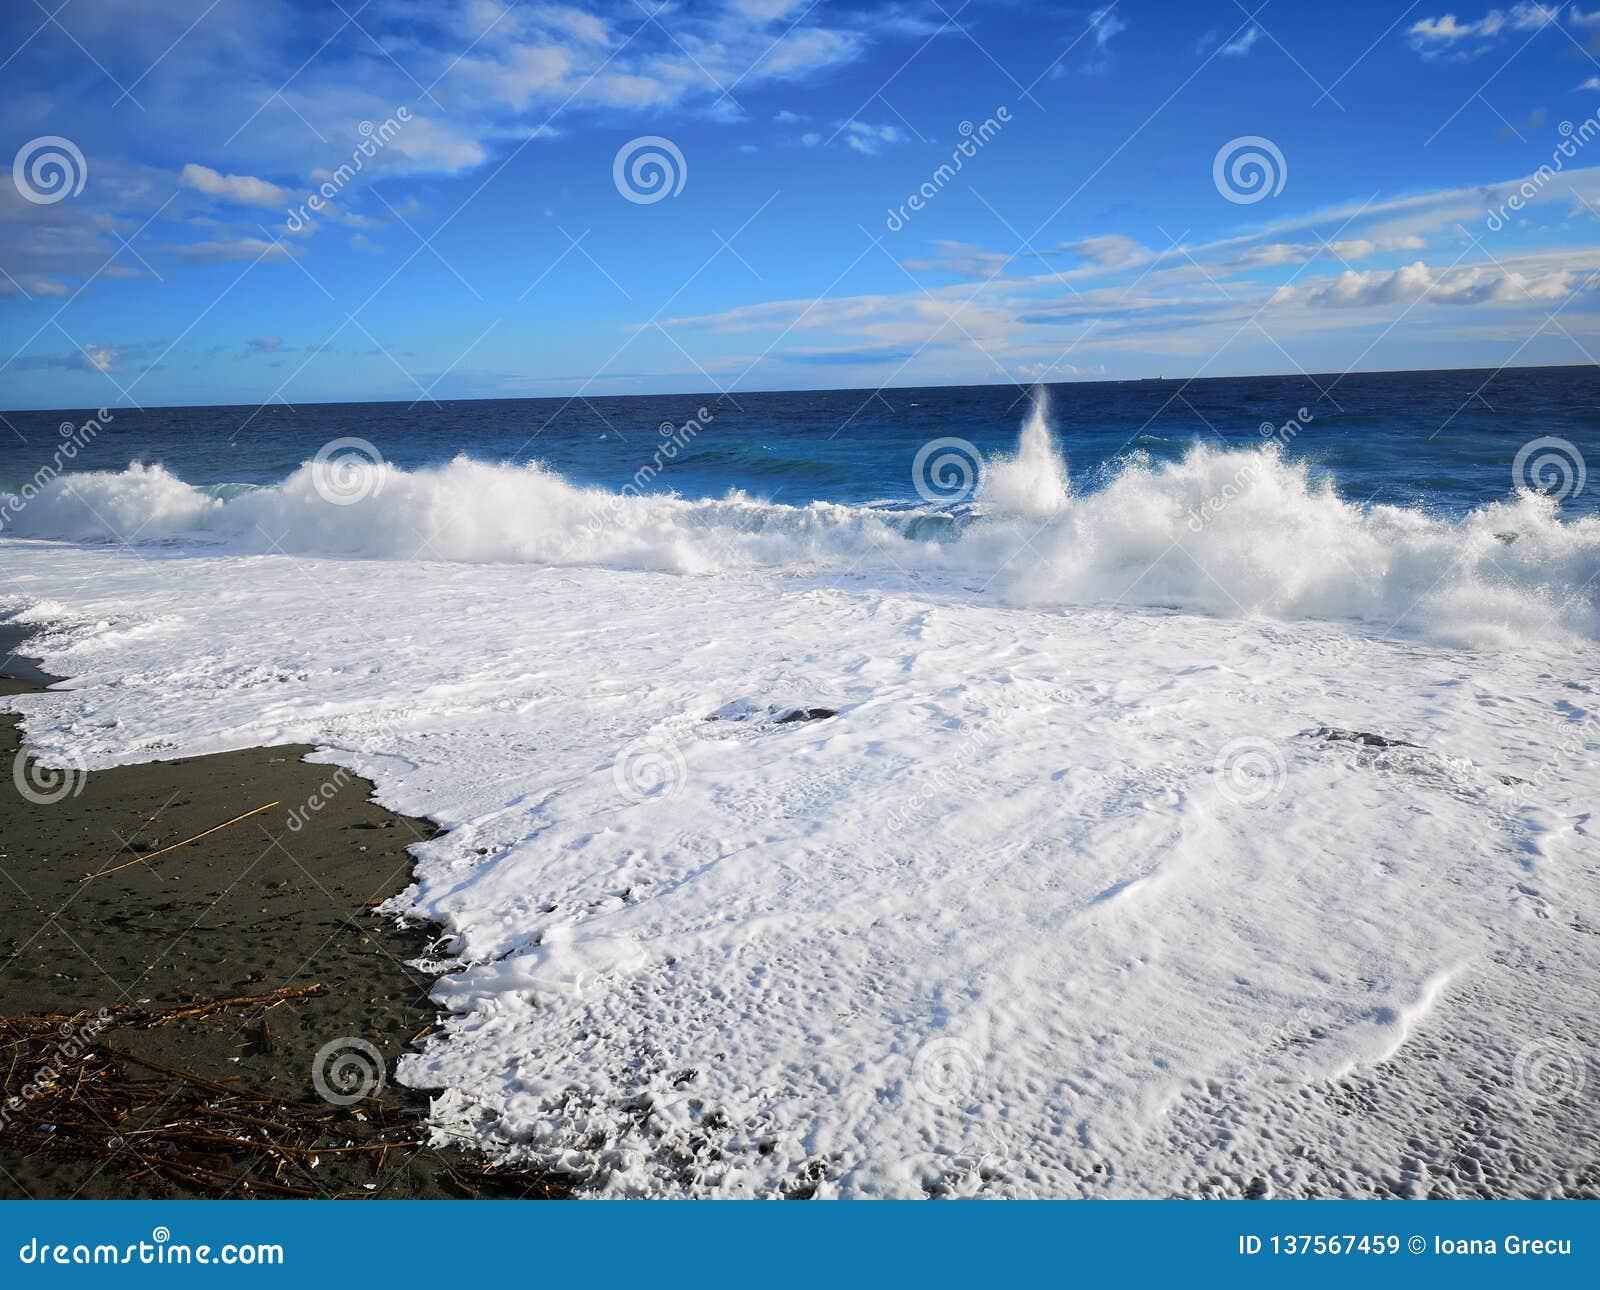 Crashing waves on beach